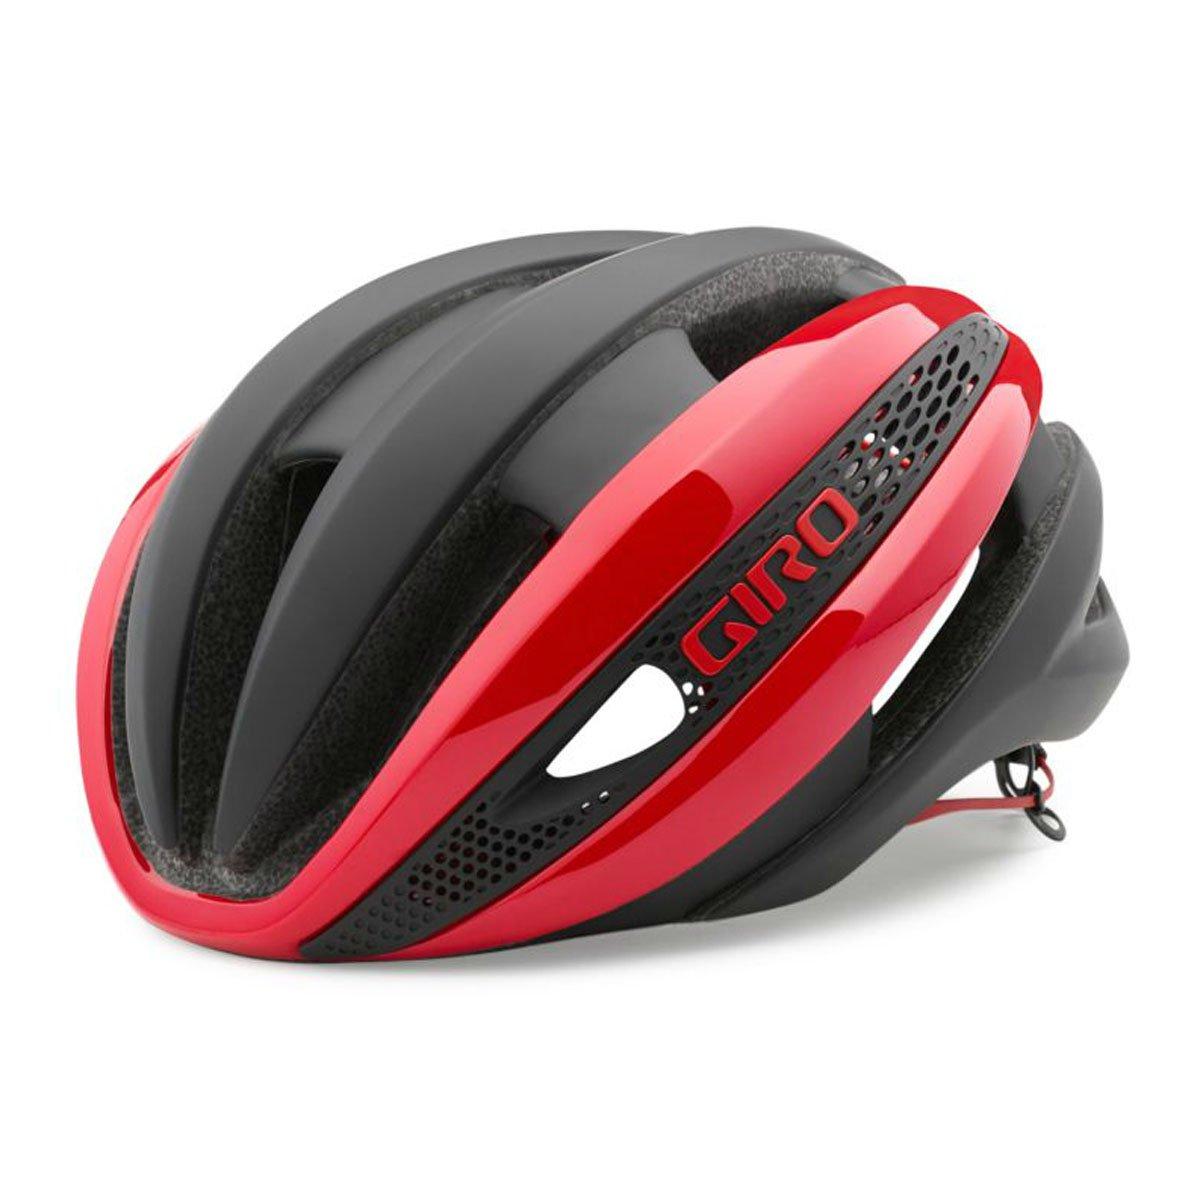 GIRO(ジロ) ヘルメット SYNTHE RED/MAT BLK Sサイズ   B00MX3U4WG